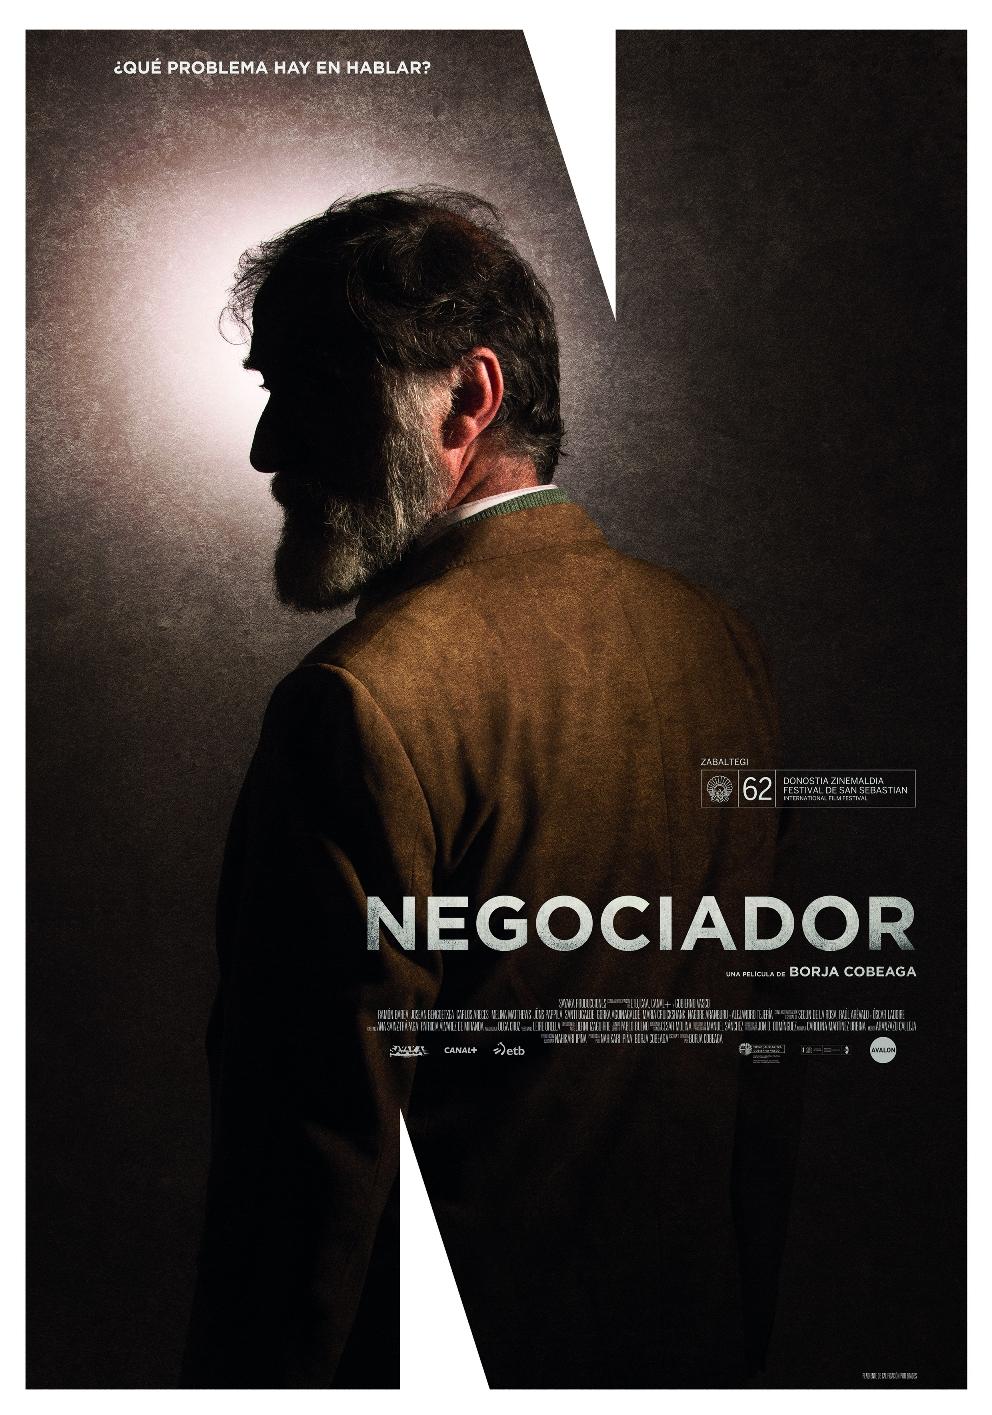 Negociador (Poster) 7040